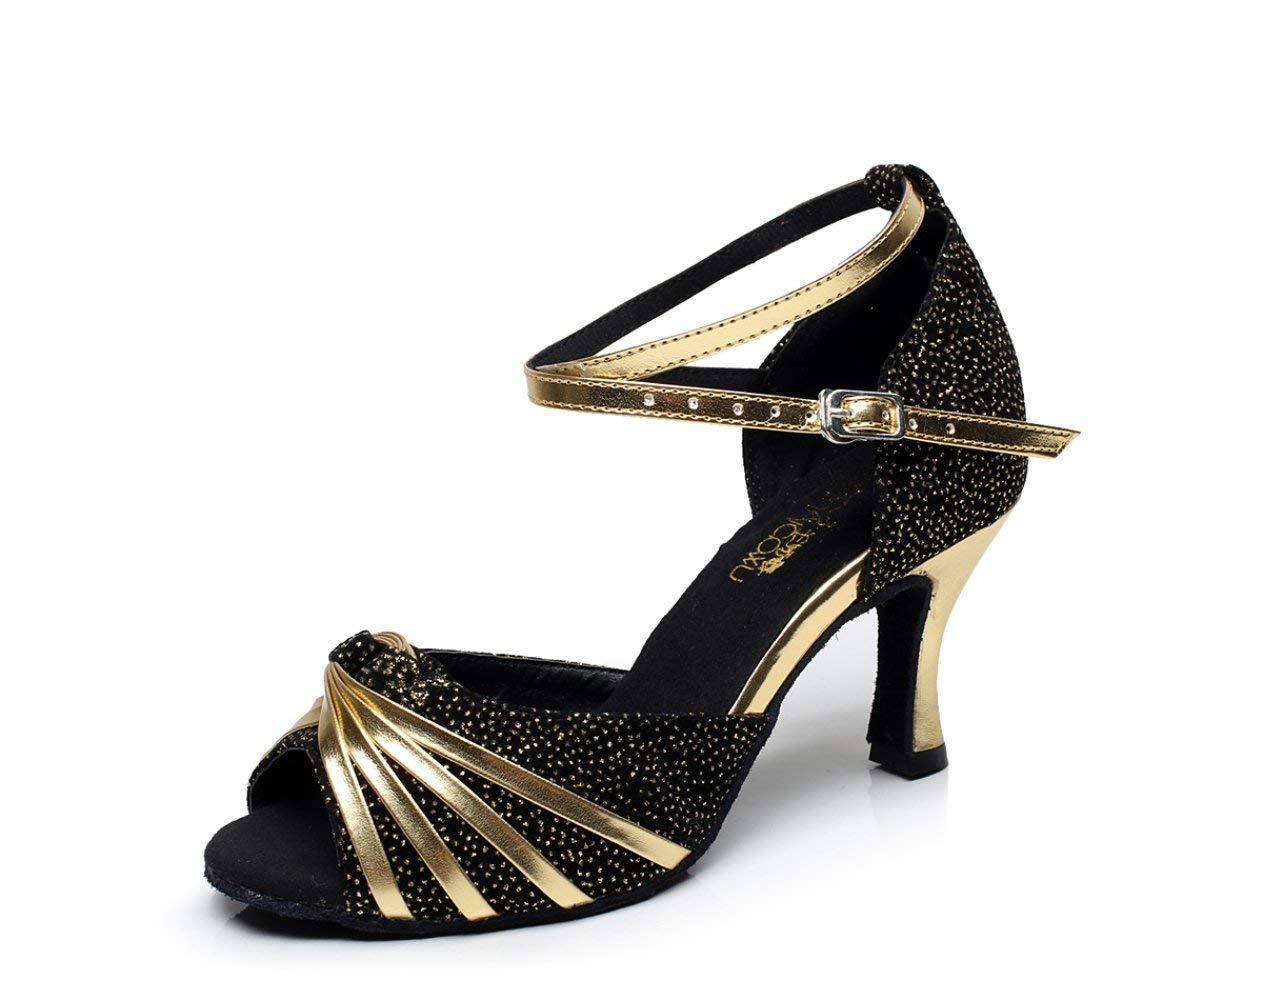 HhGold Latin Schuhe für Damen Glanz Salsa Tango Chacha Samba Modern Jazz Dance Sandalen Hohe Absätze Gold6cm-UK5.5   EU38   Our39 (Farbe   schwarz8.5cm Größe   UK4.5 EU36 Our37)